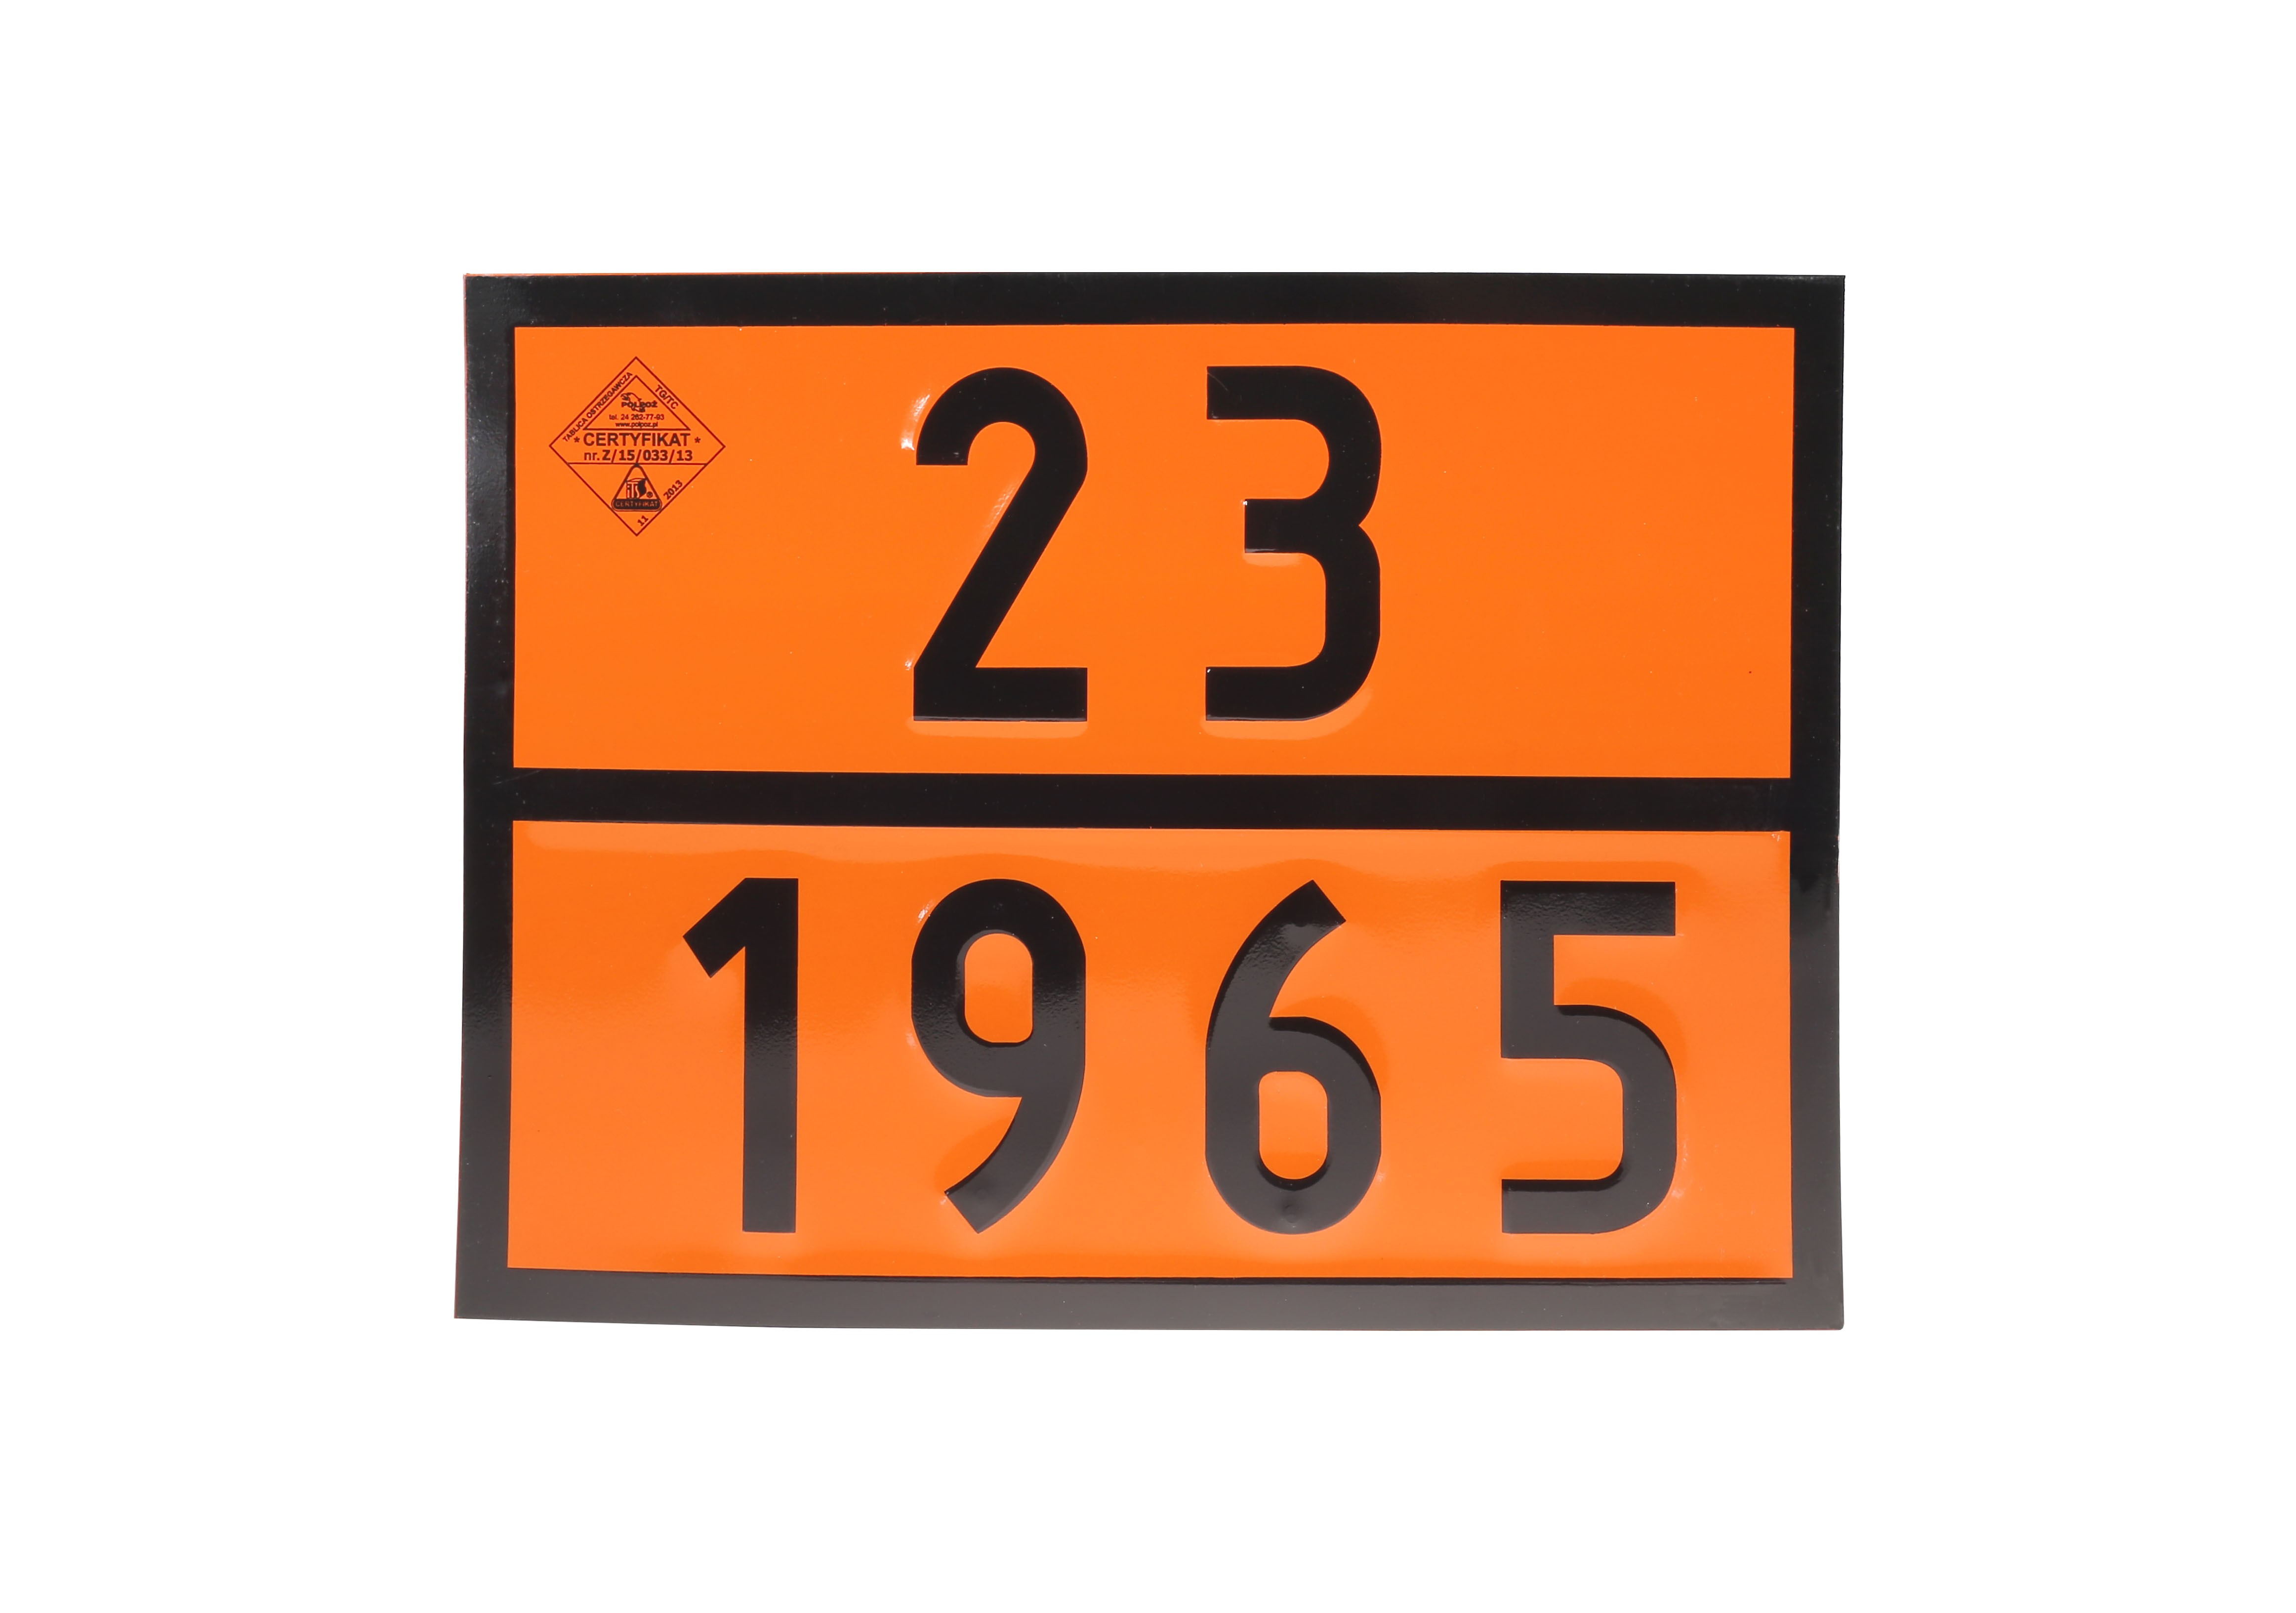 Tablica ADR numeryczna 23-1965 LPG